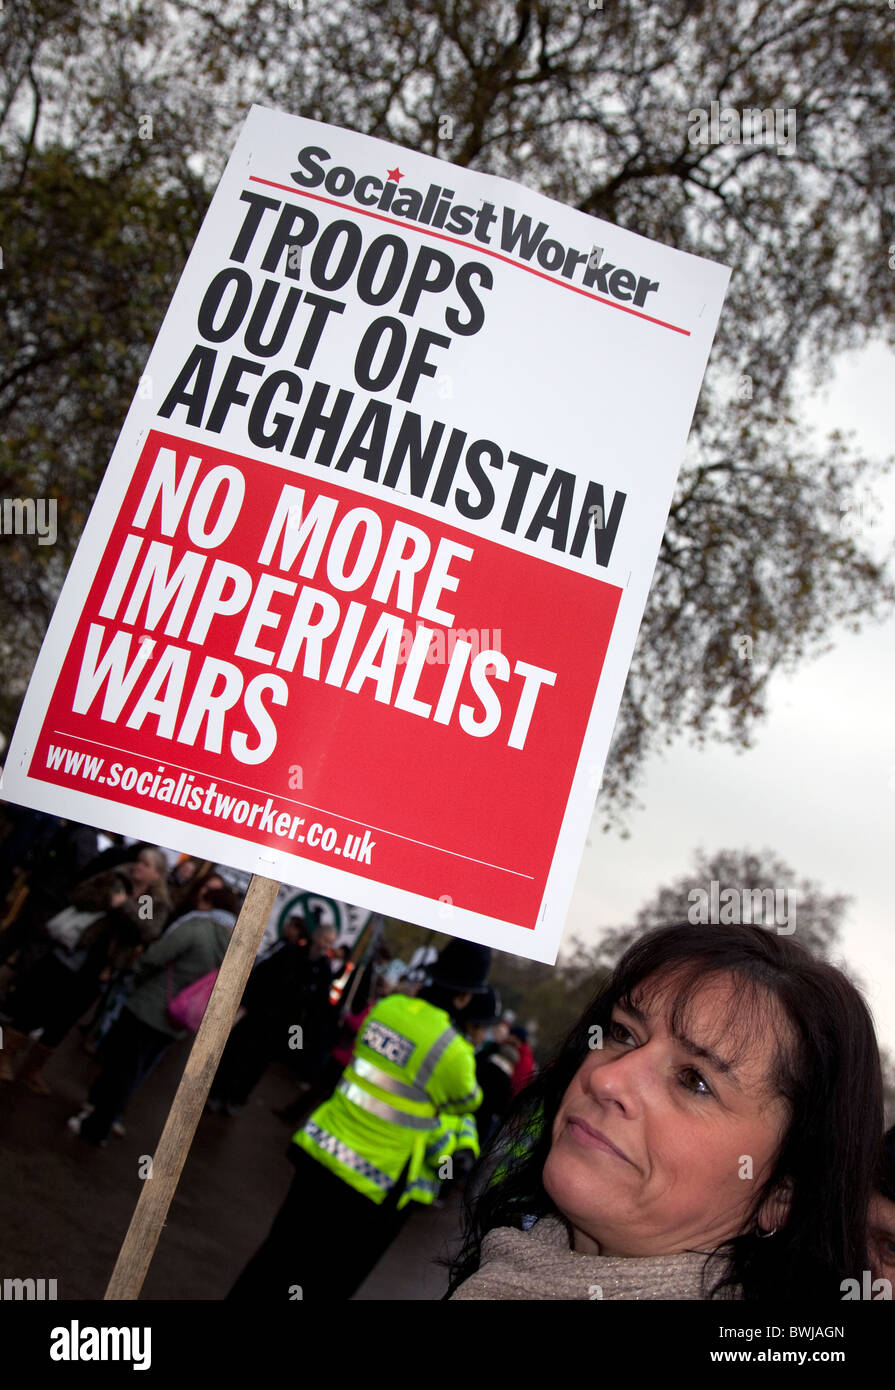 Anti-Afghanistan war demonstration in London - Stock Image